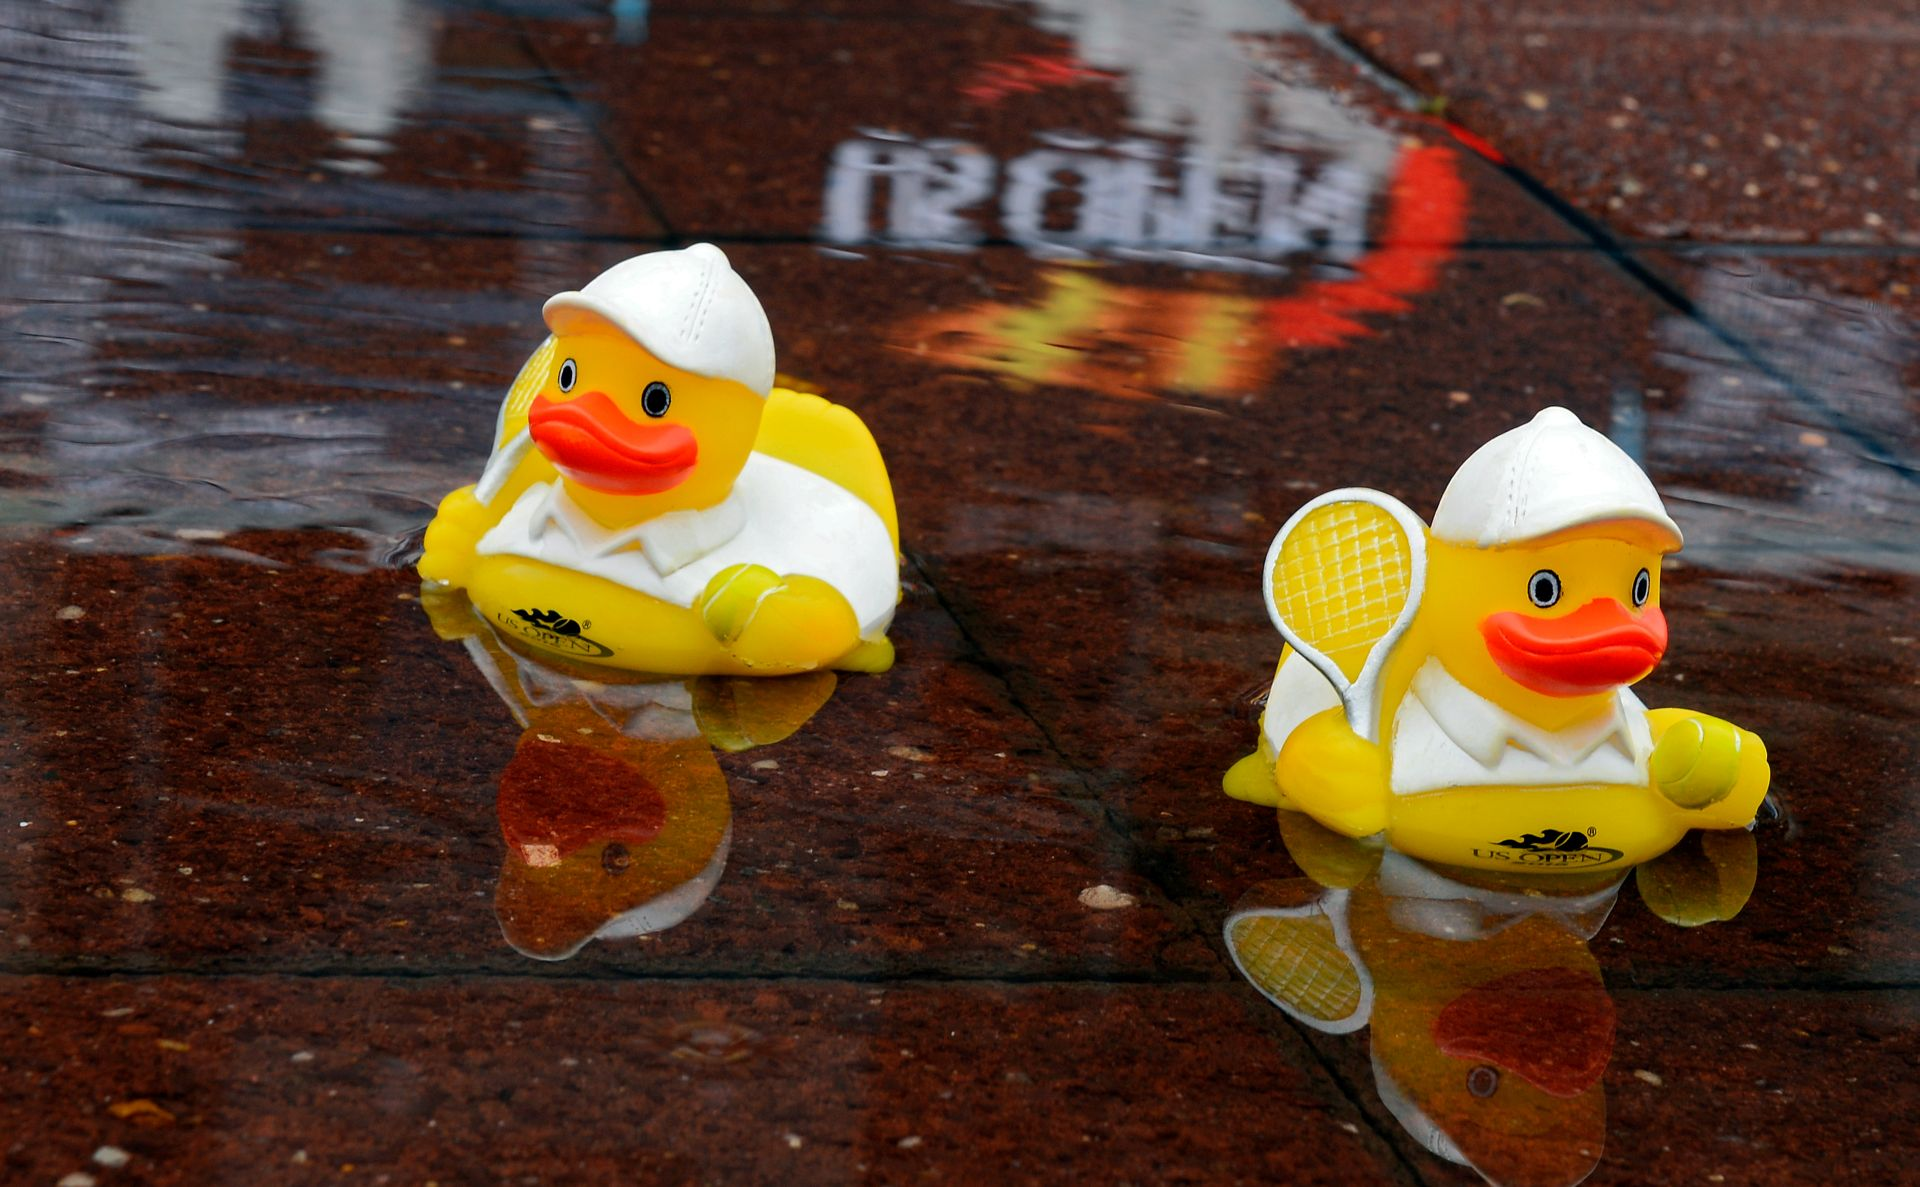 US OPEN Jaka kiša odgodila polufinale tenisačica, pomaknuta i muška polufinala